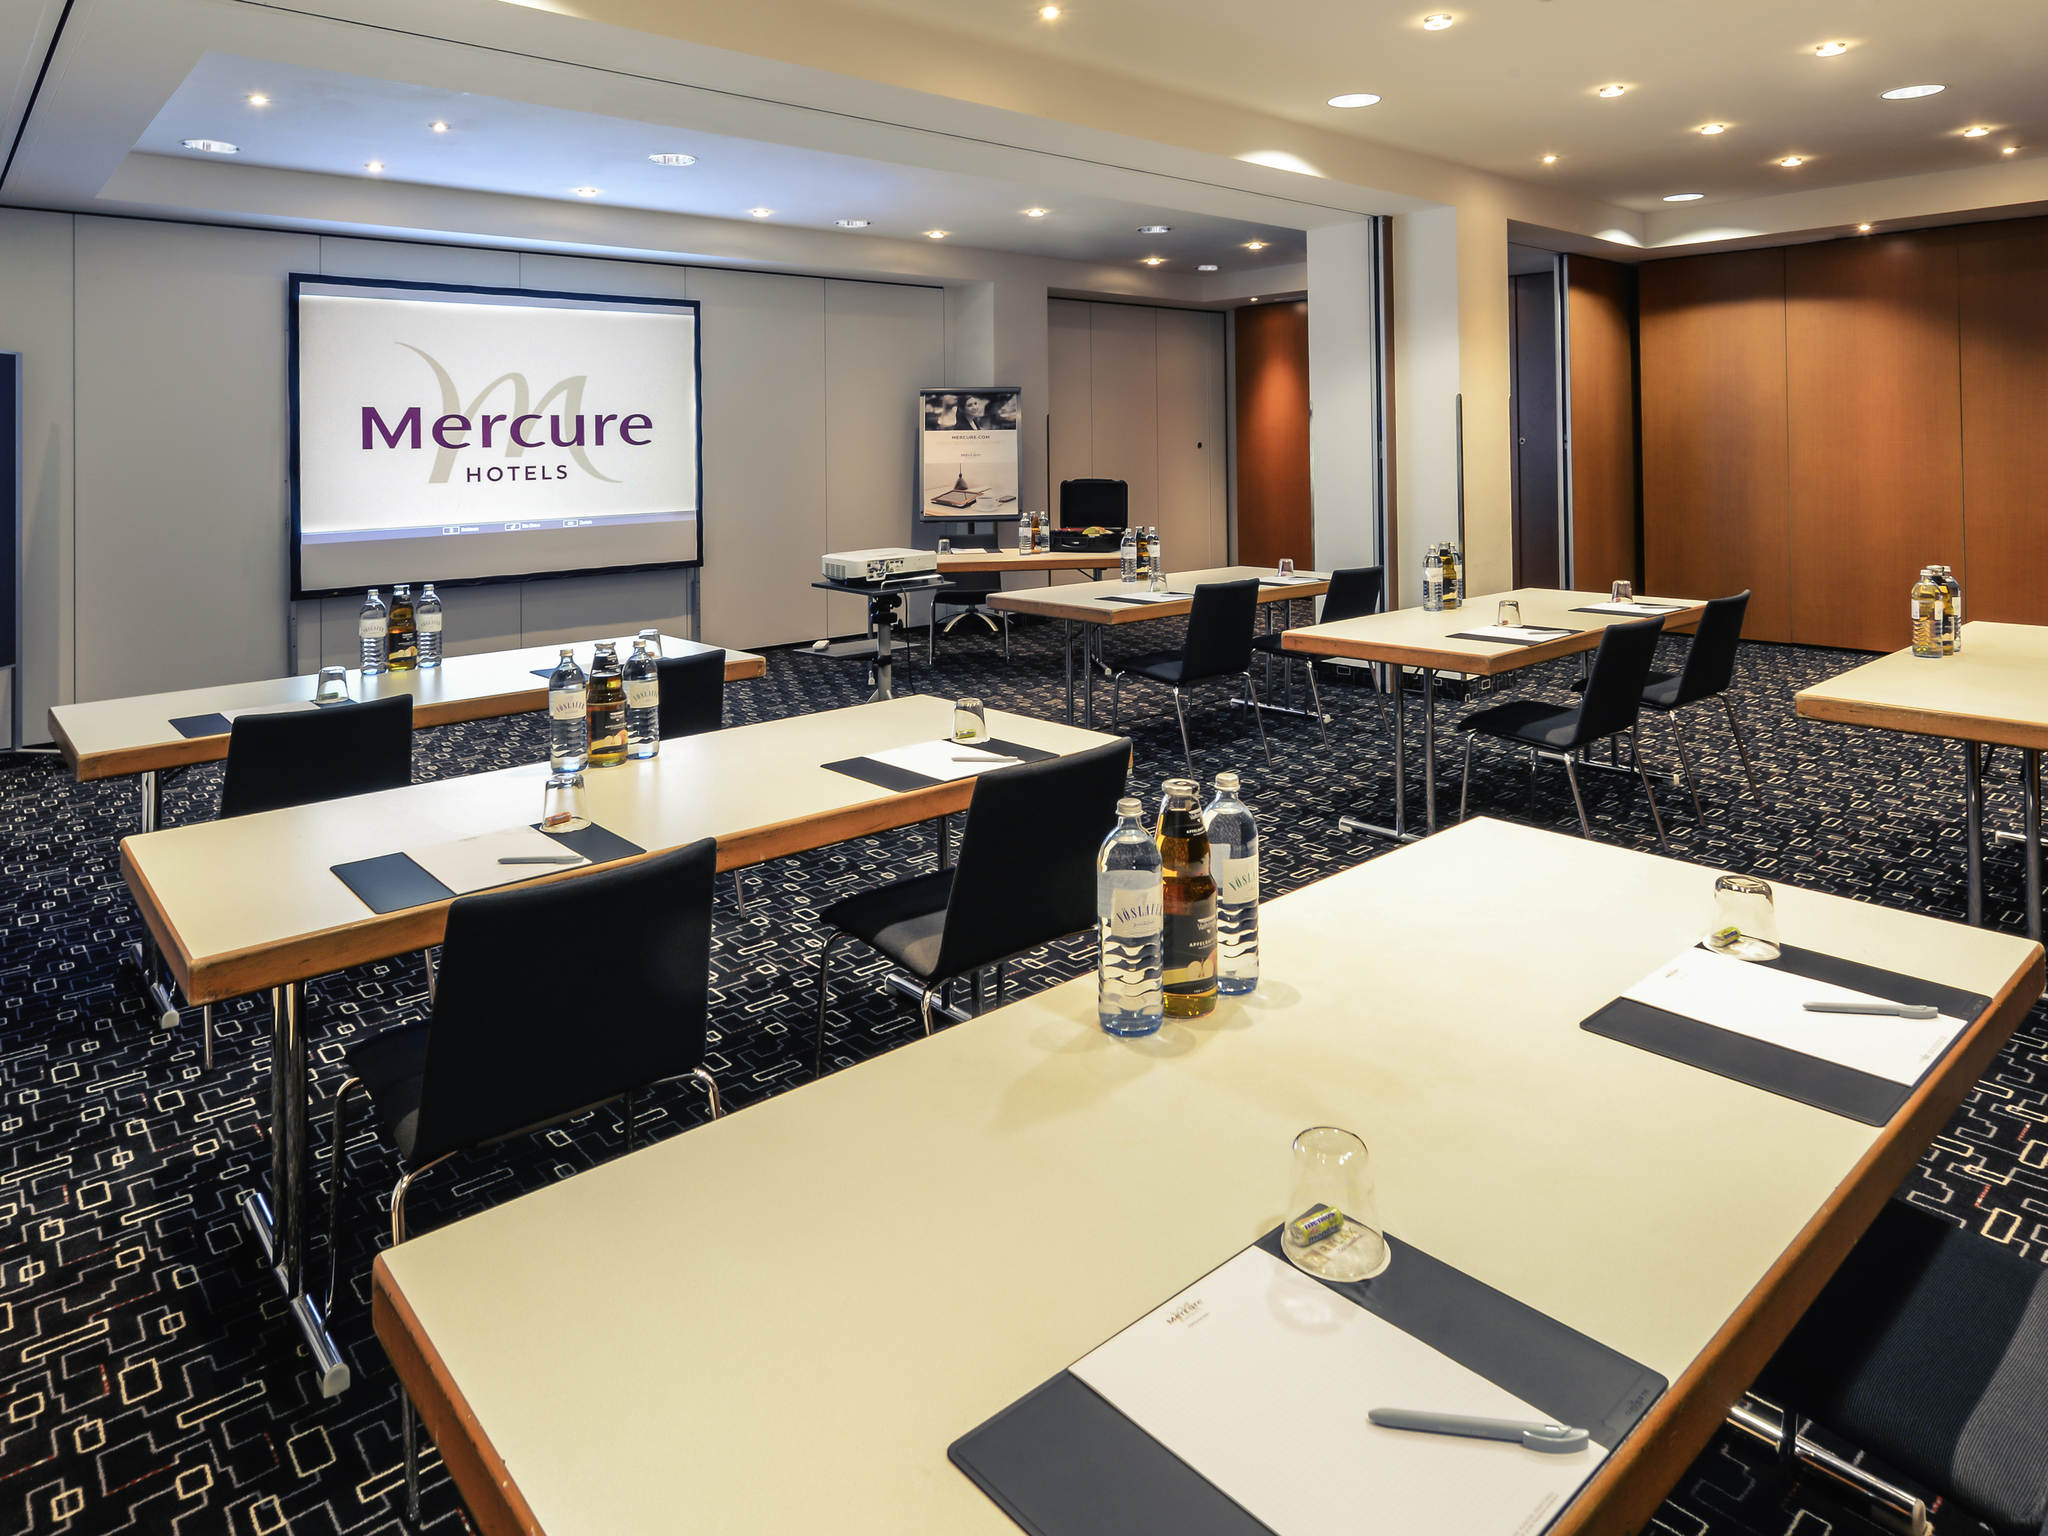 4 Star Hotel Vienna Westbahnhof Mercure Accorhotels